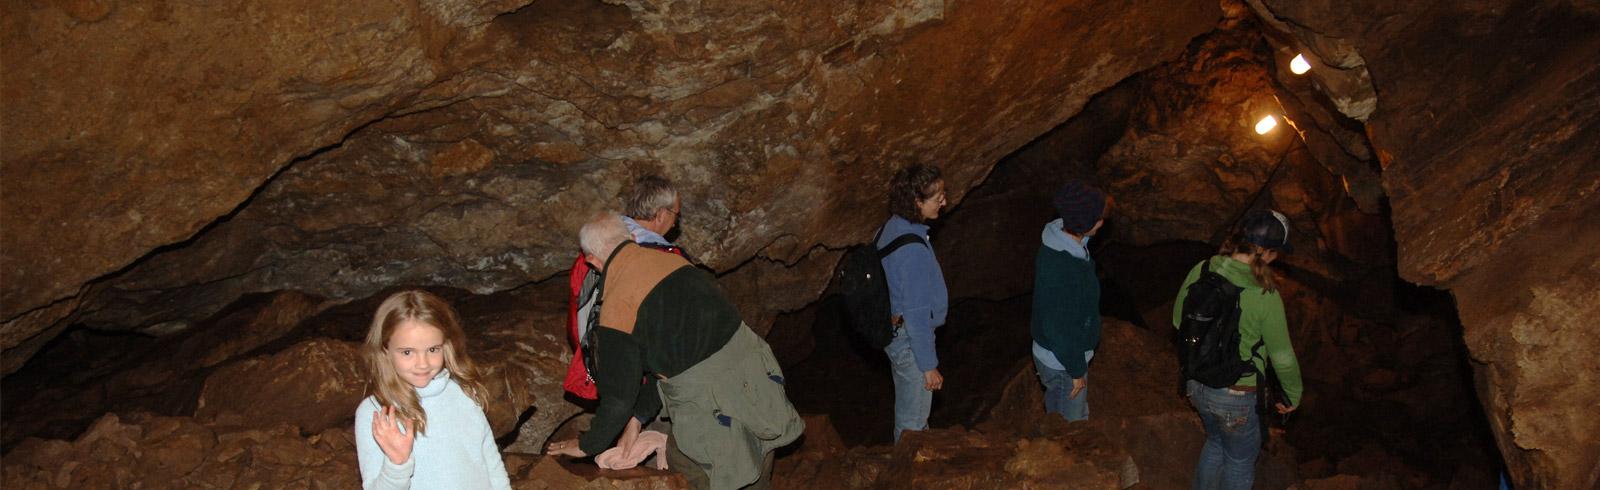 Ozark Caverns at Osage Beach